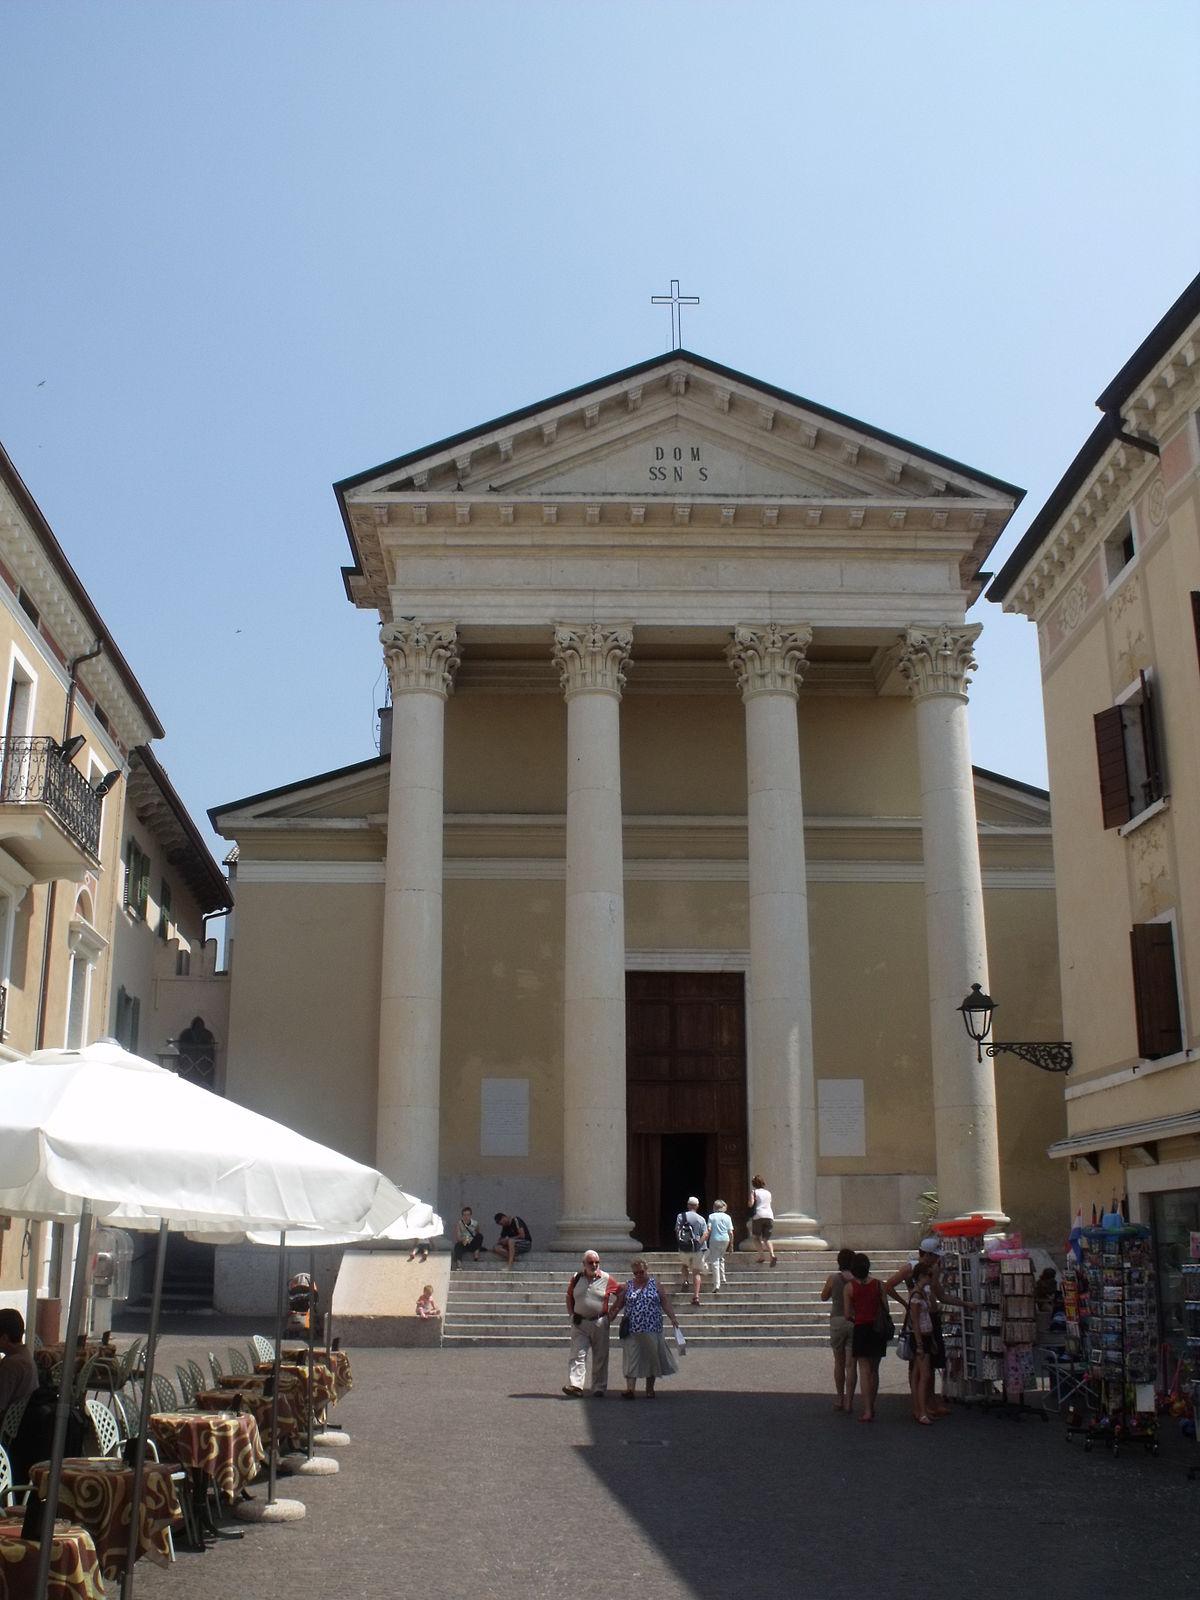 Church of San Nicolò and San Severo (Bardolino) - Wikipedia